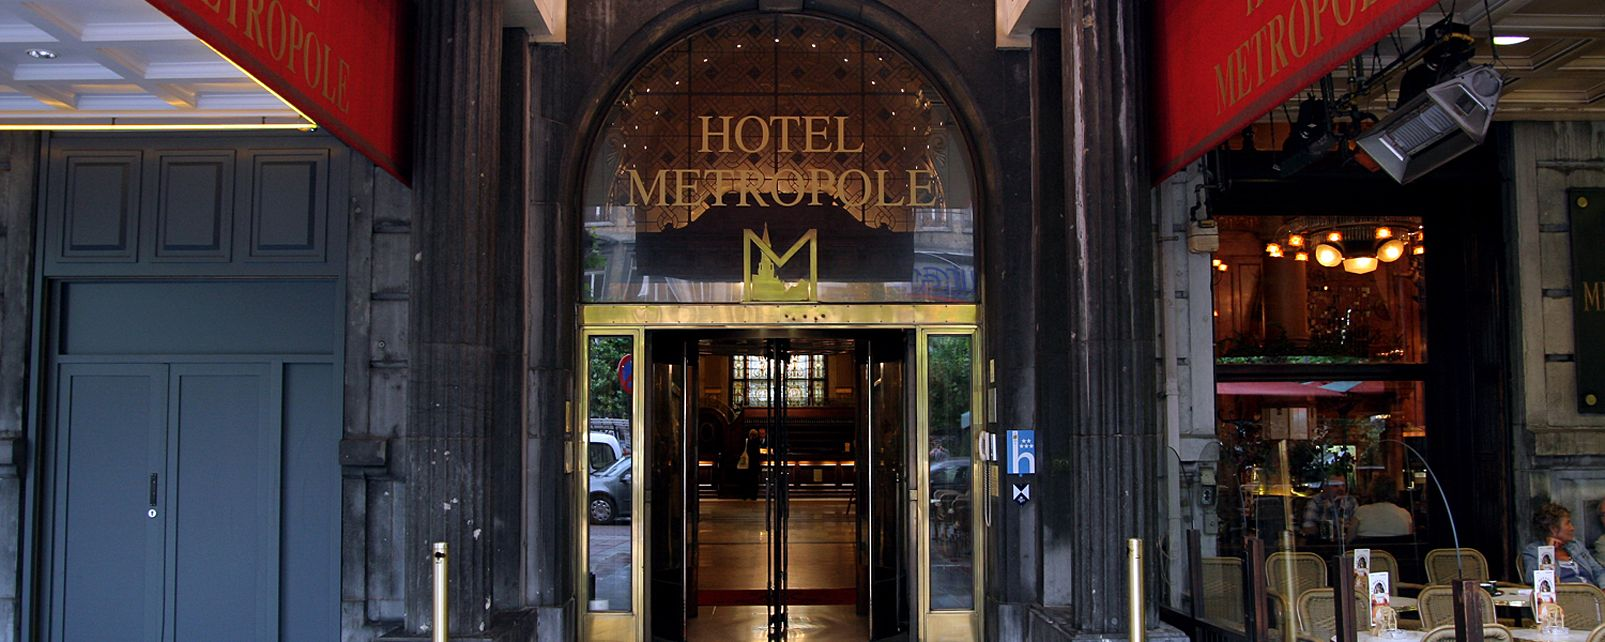 Hôtel Metropole